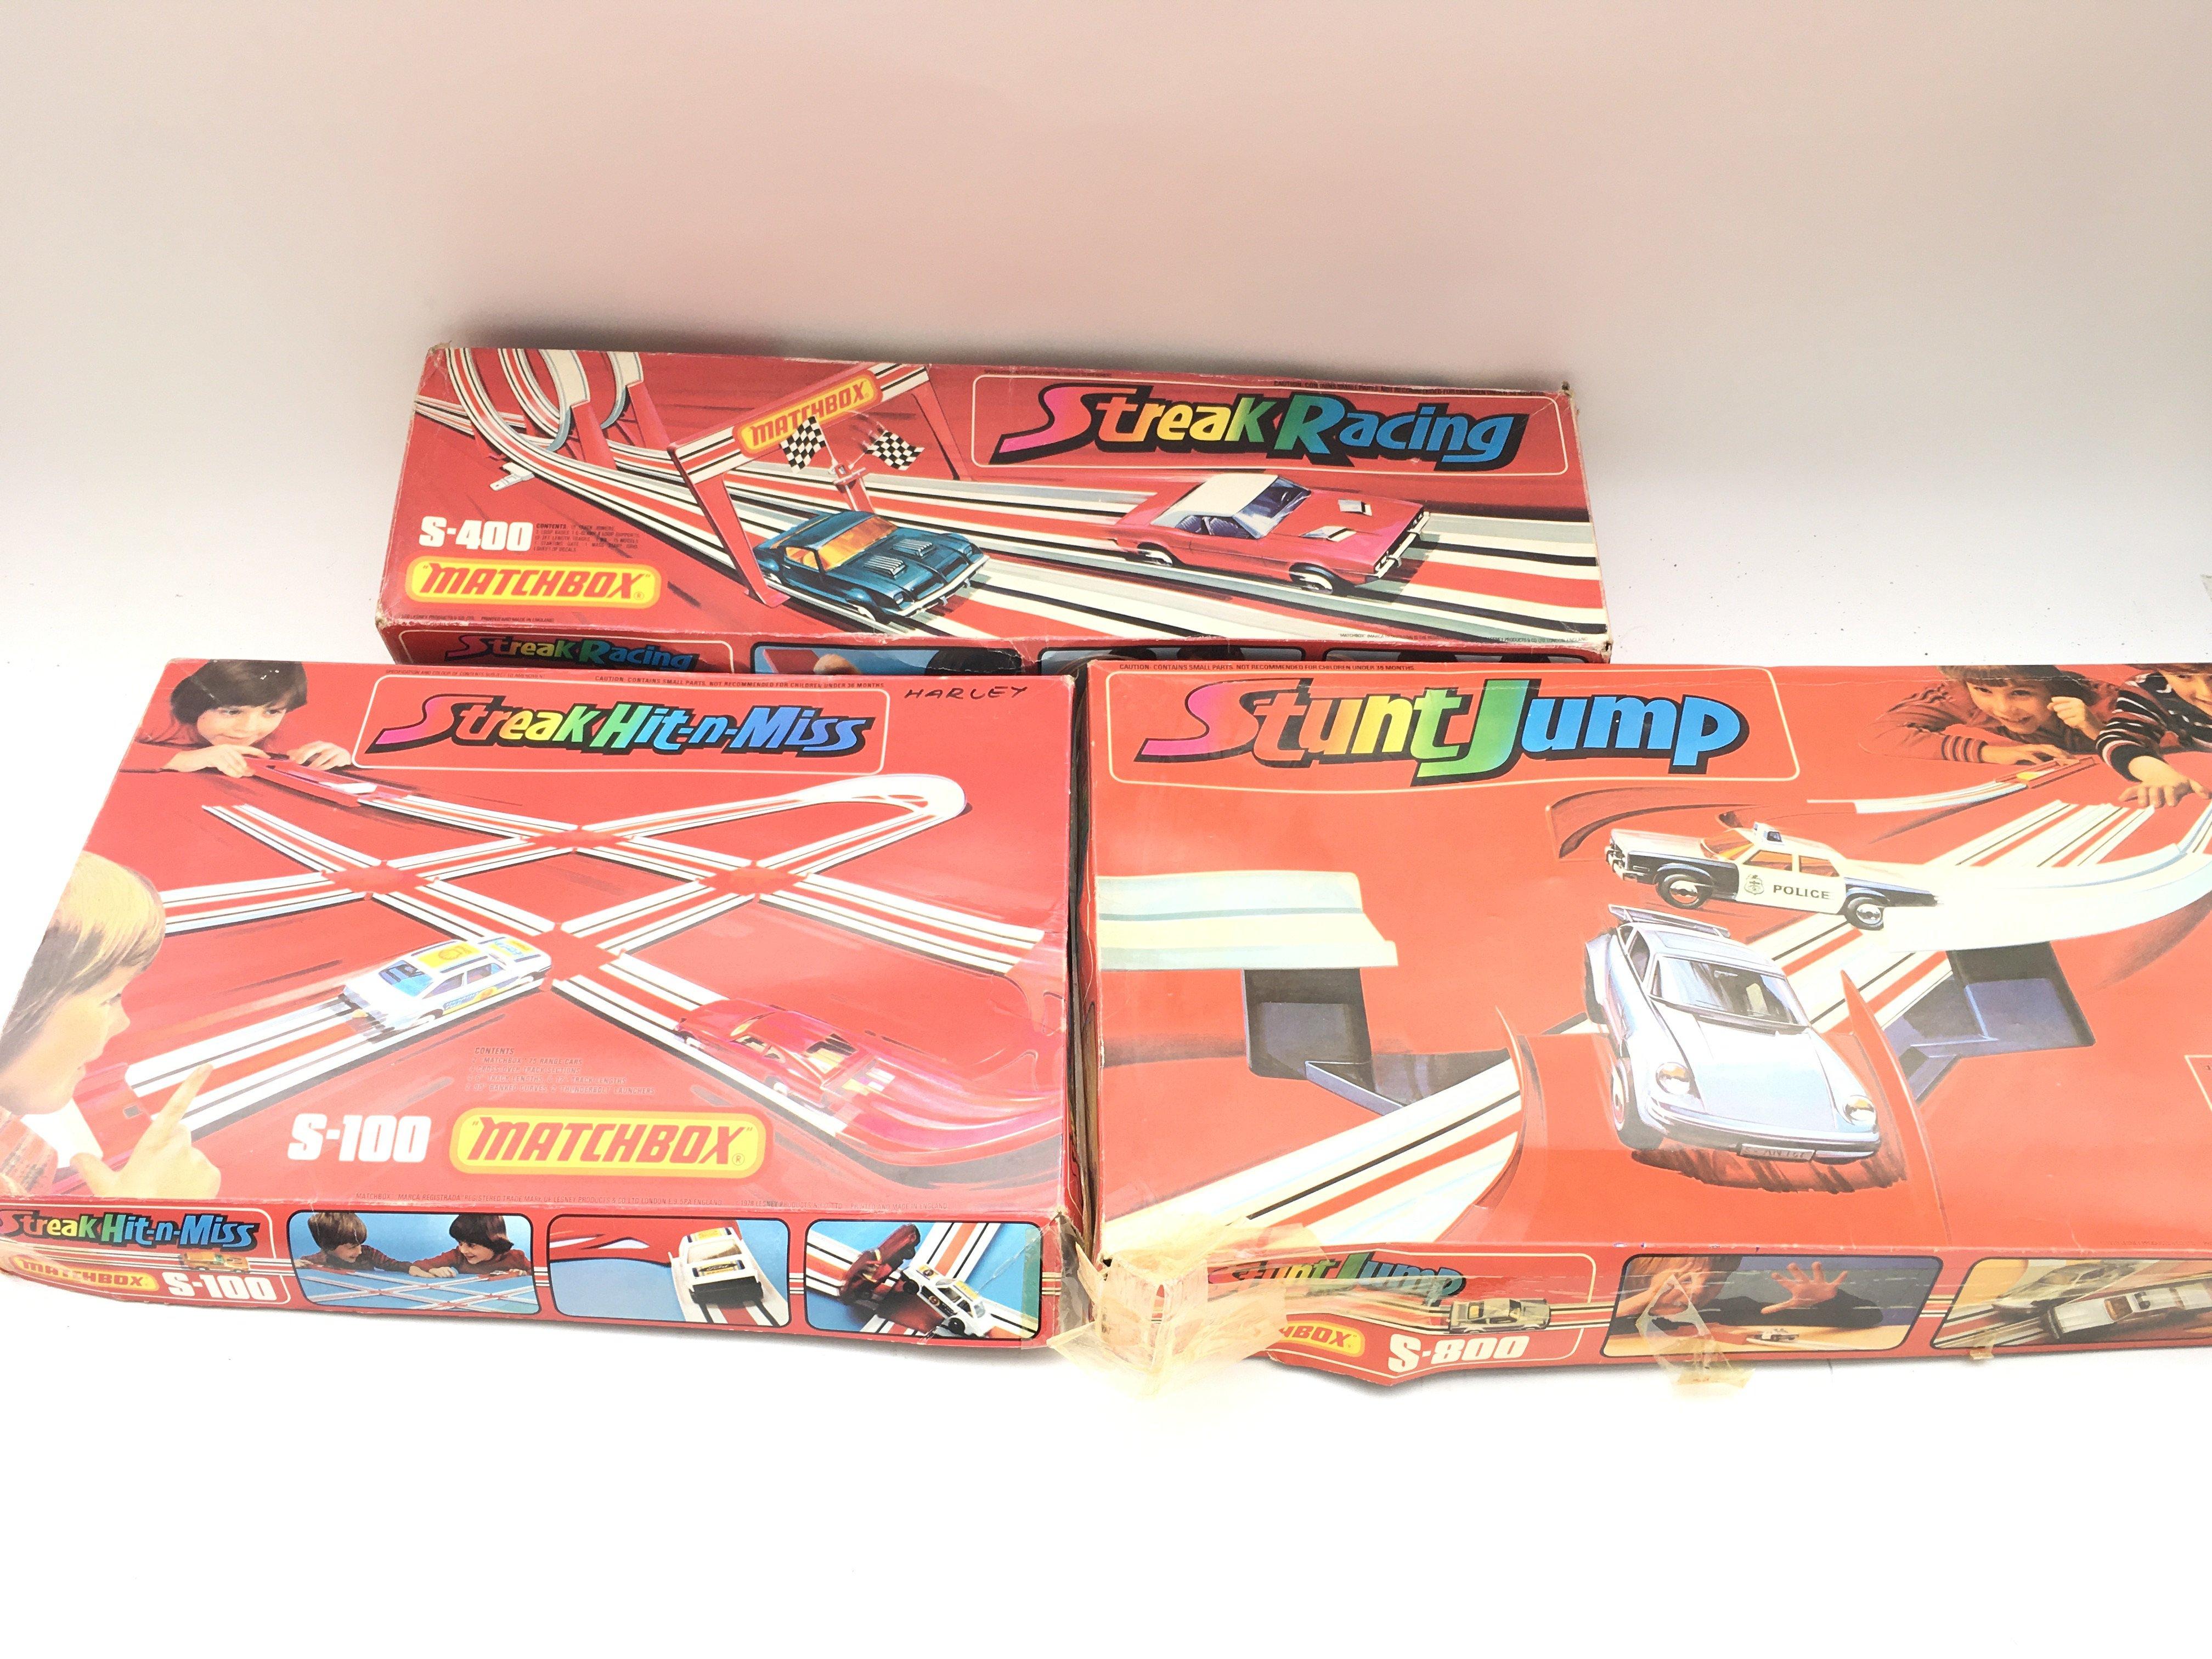 Collection of vintage matchbox tracks. Streak racing. Stunt jump. Streak hit n miss.